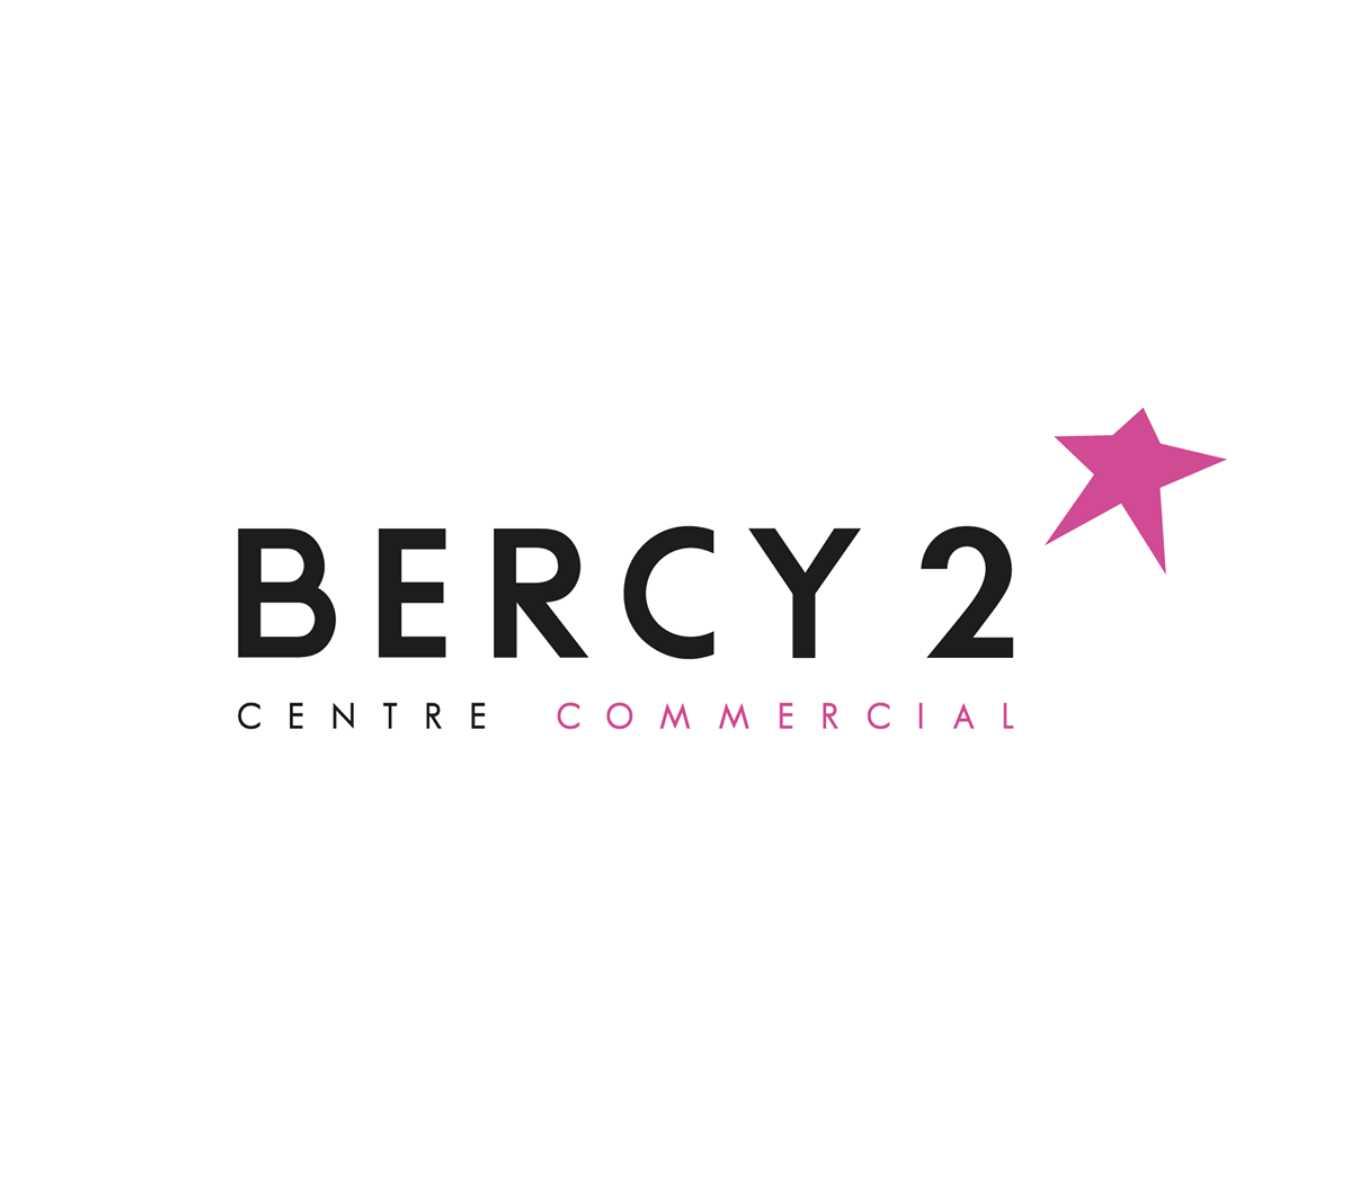 Bercy 2 good.jpg